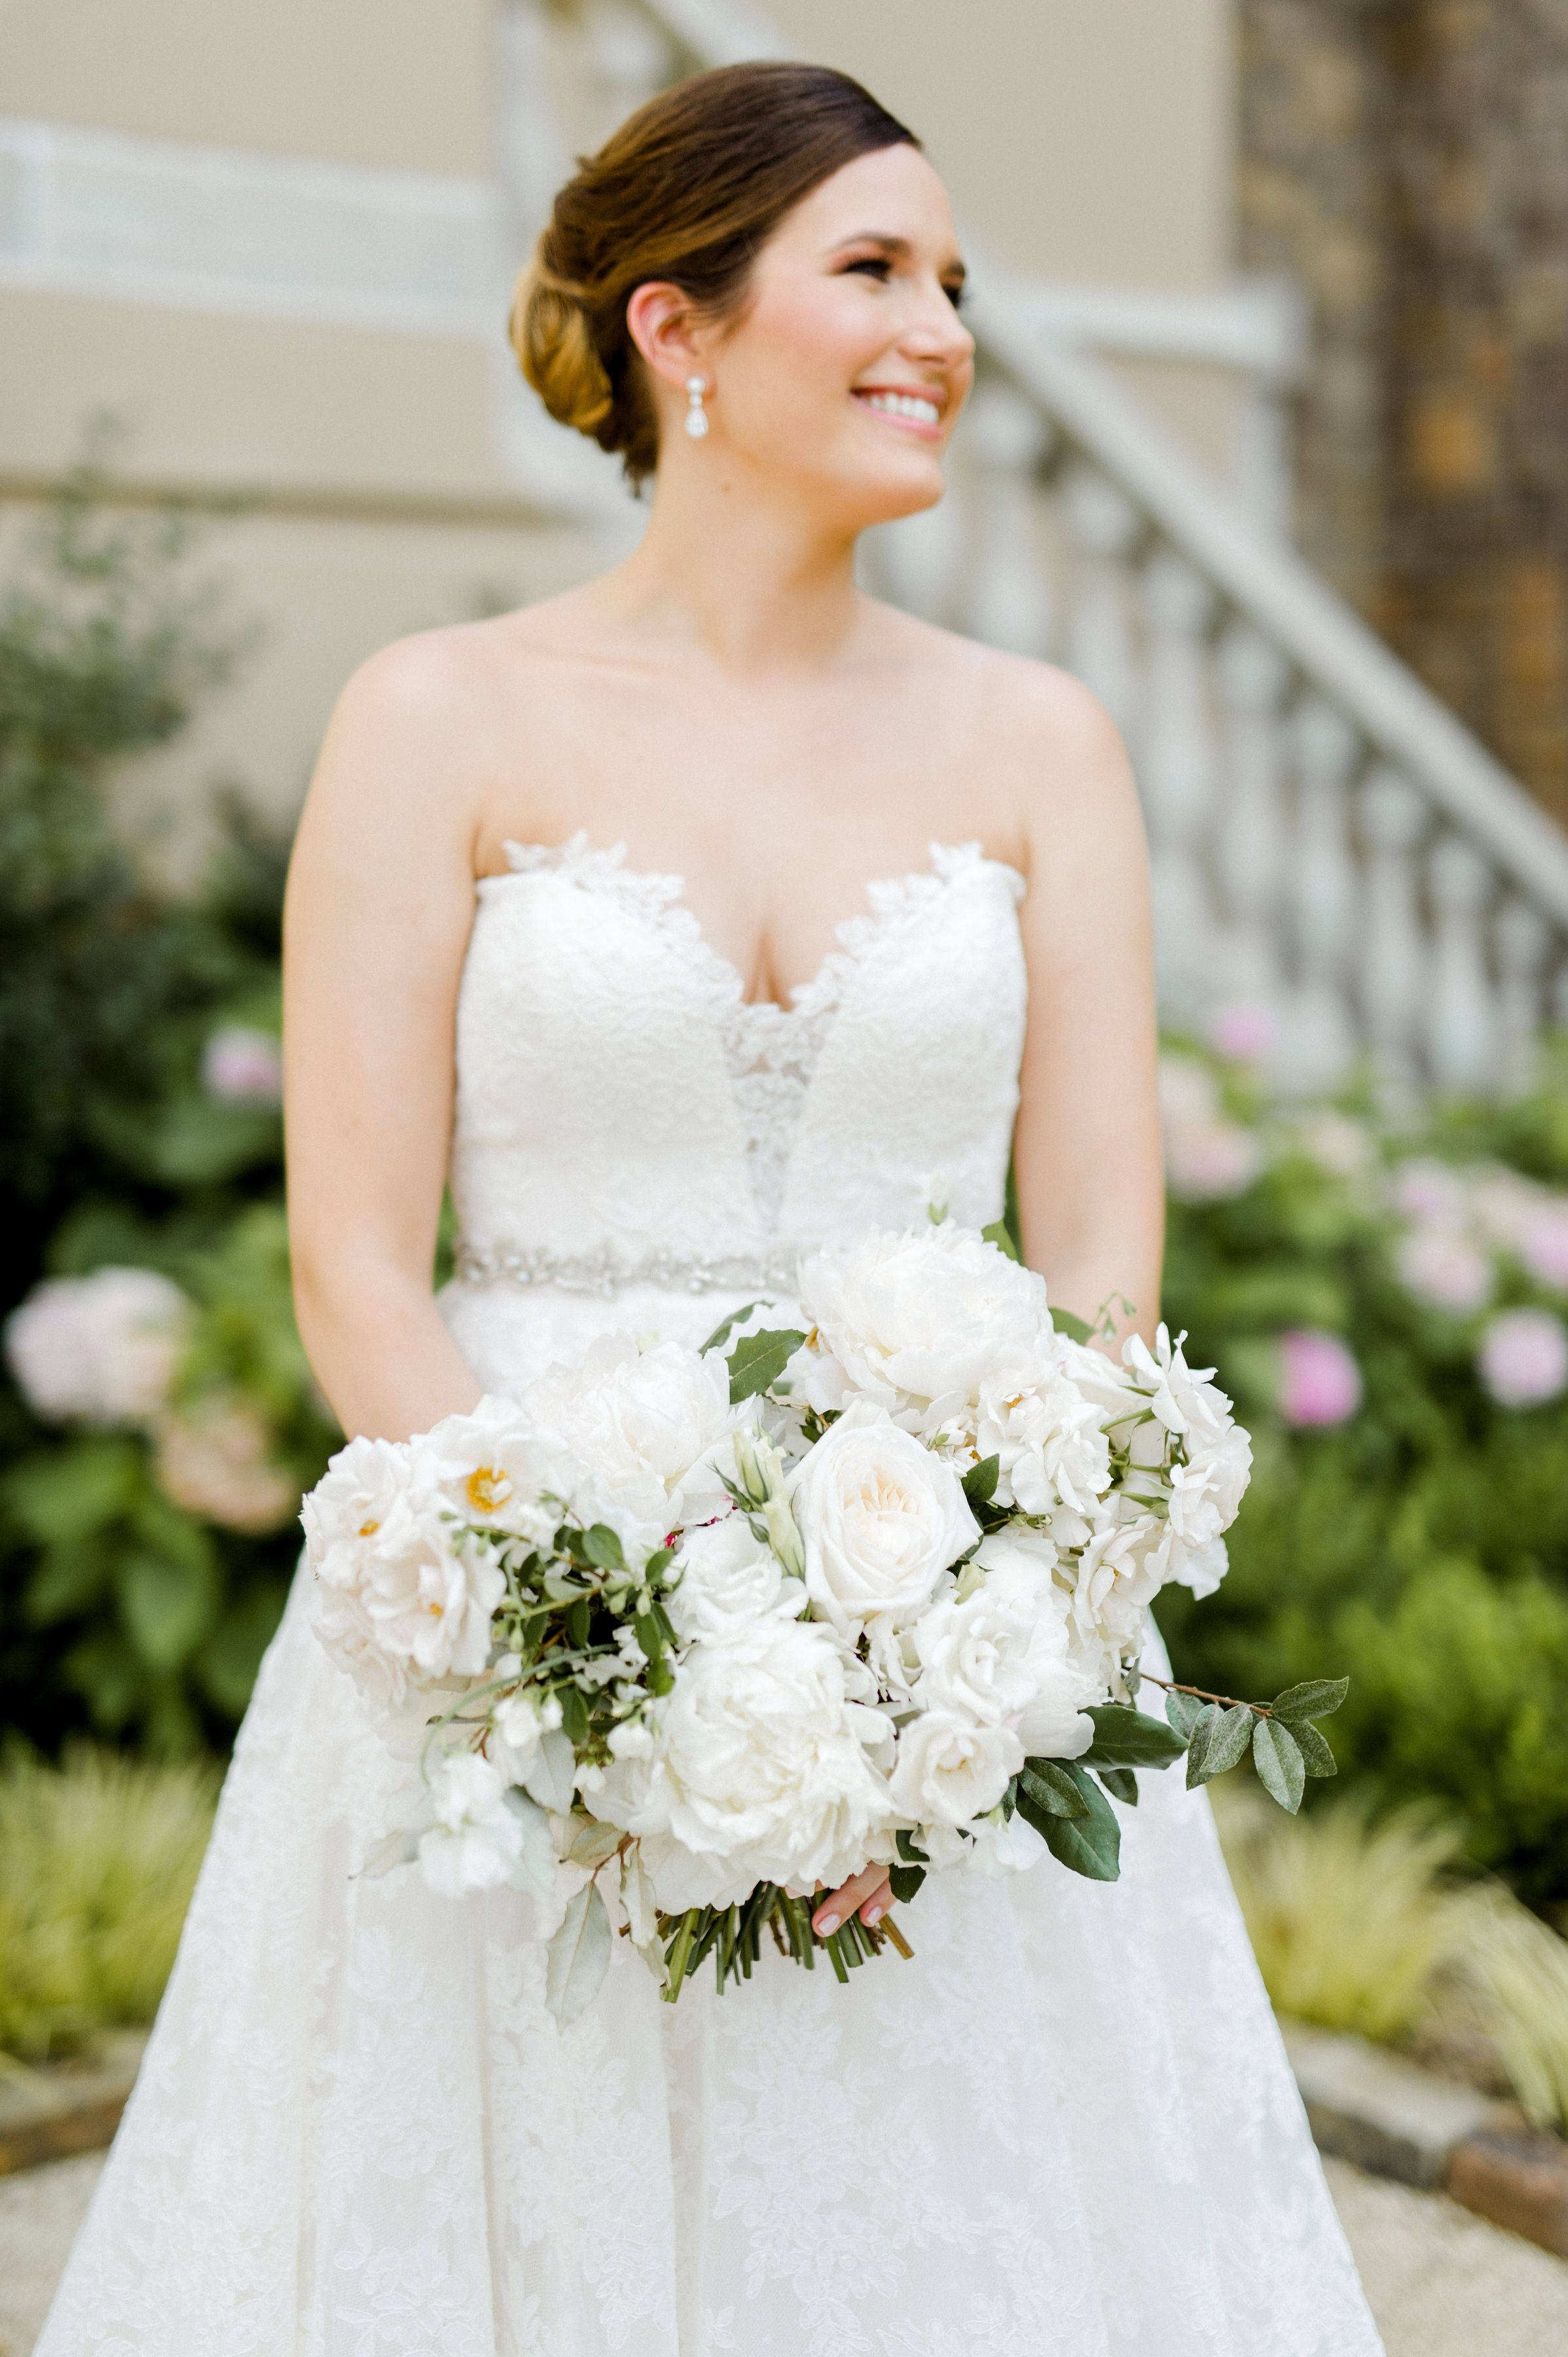 McElravey_Wedding_CarolineLimaPhotography_2018_192.jpg